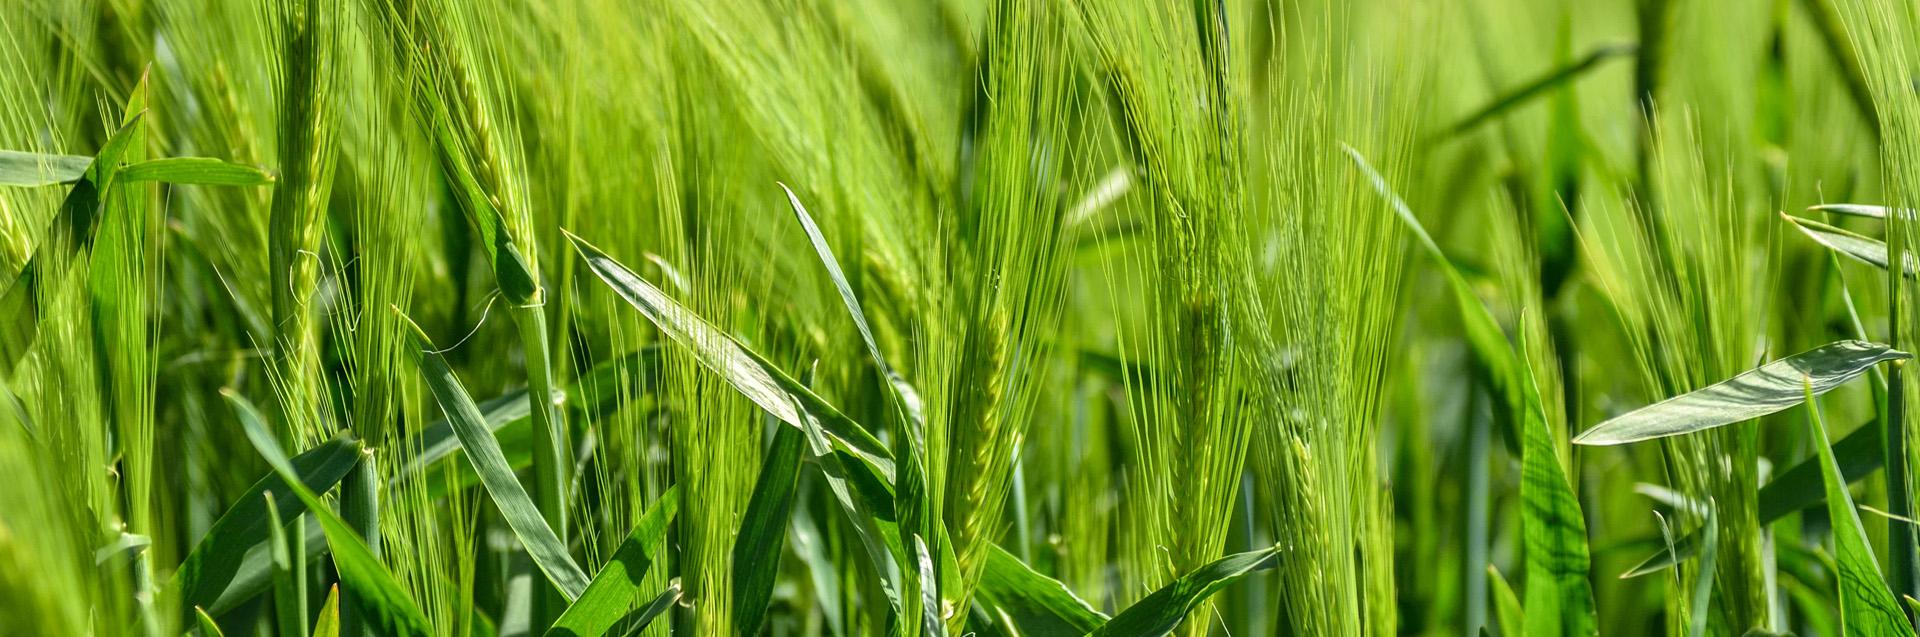 Herbal Agro Organics - Manufacturers of Organic Fertilizers